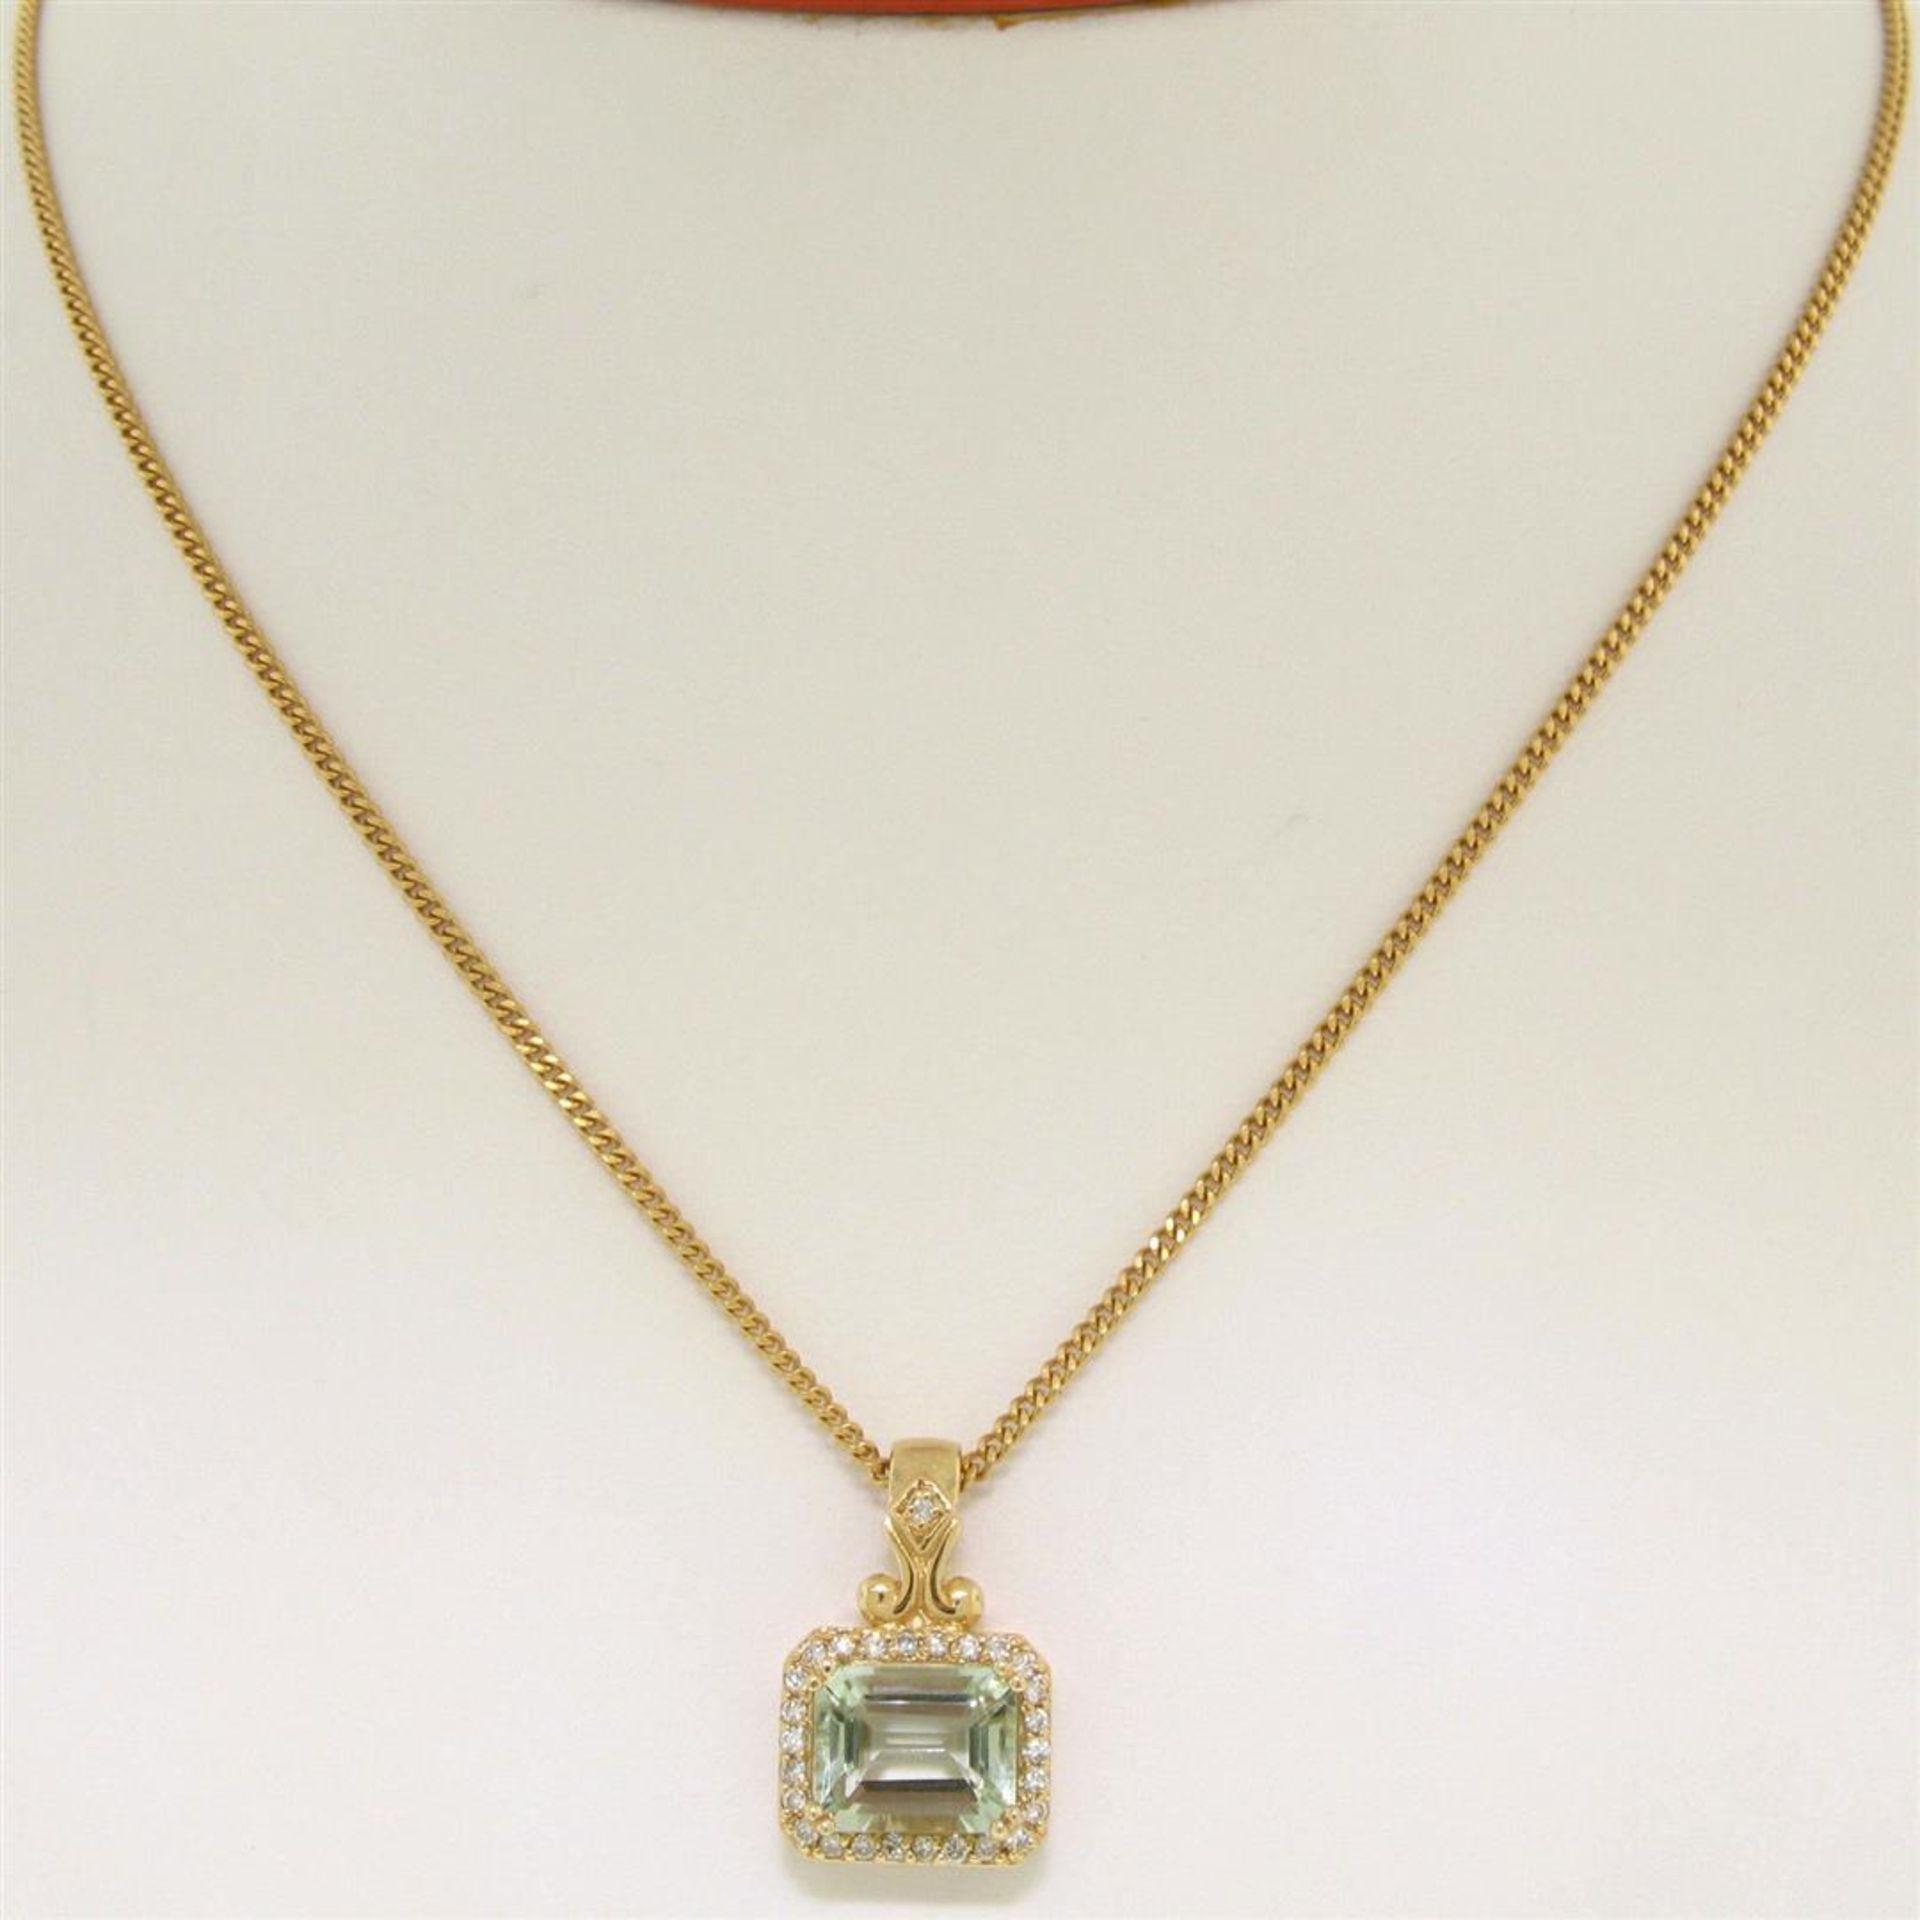 "14K Yellow Gold 3.77ctw VS Diamond Green Amethyst Pendant w/ 20"" Curb Chain - Image 5 of 7"